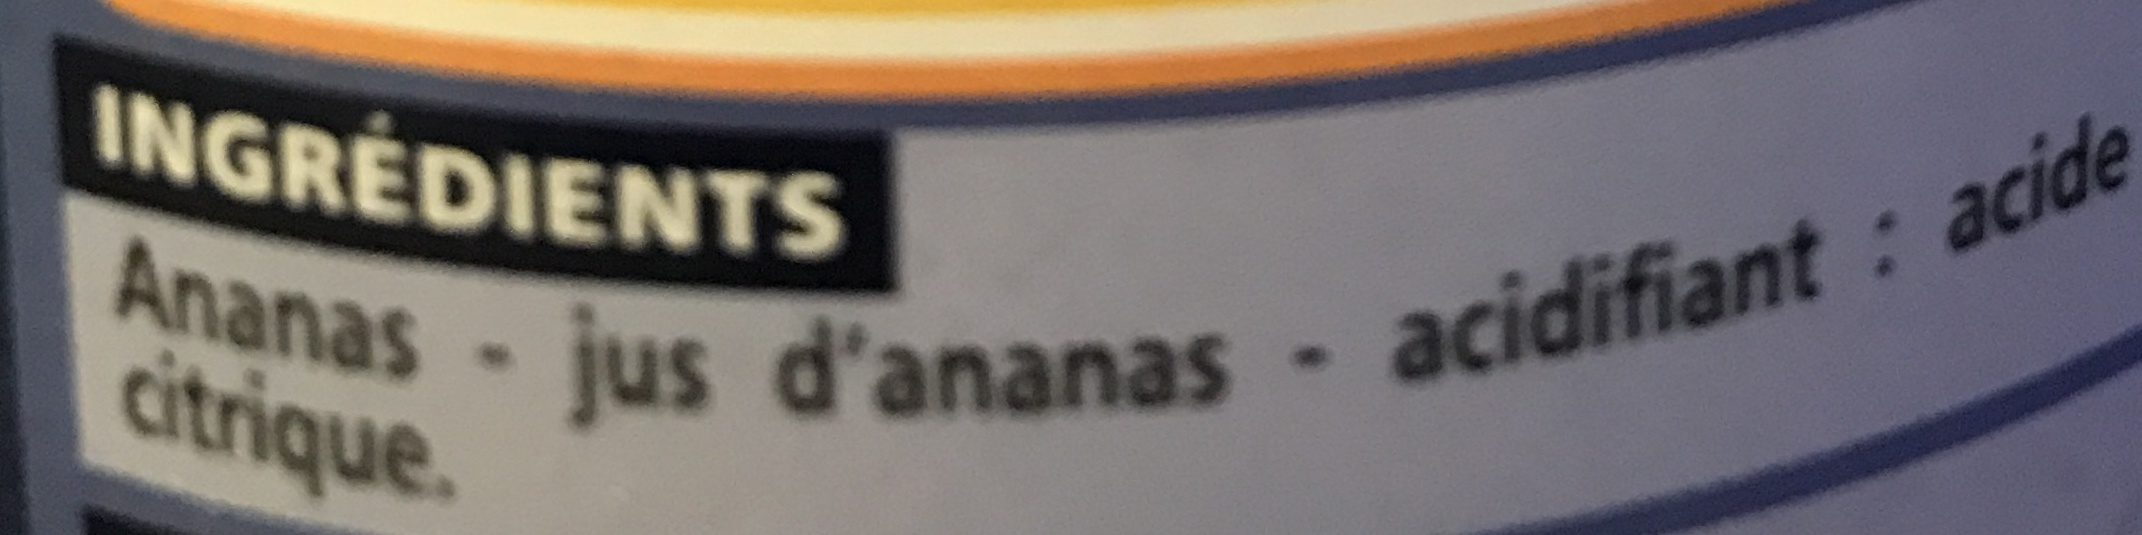 Ananas en morceaux au jus d'ananas - Ingrediënten - fr